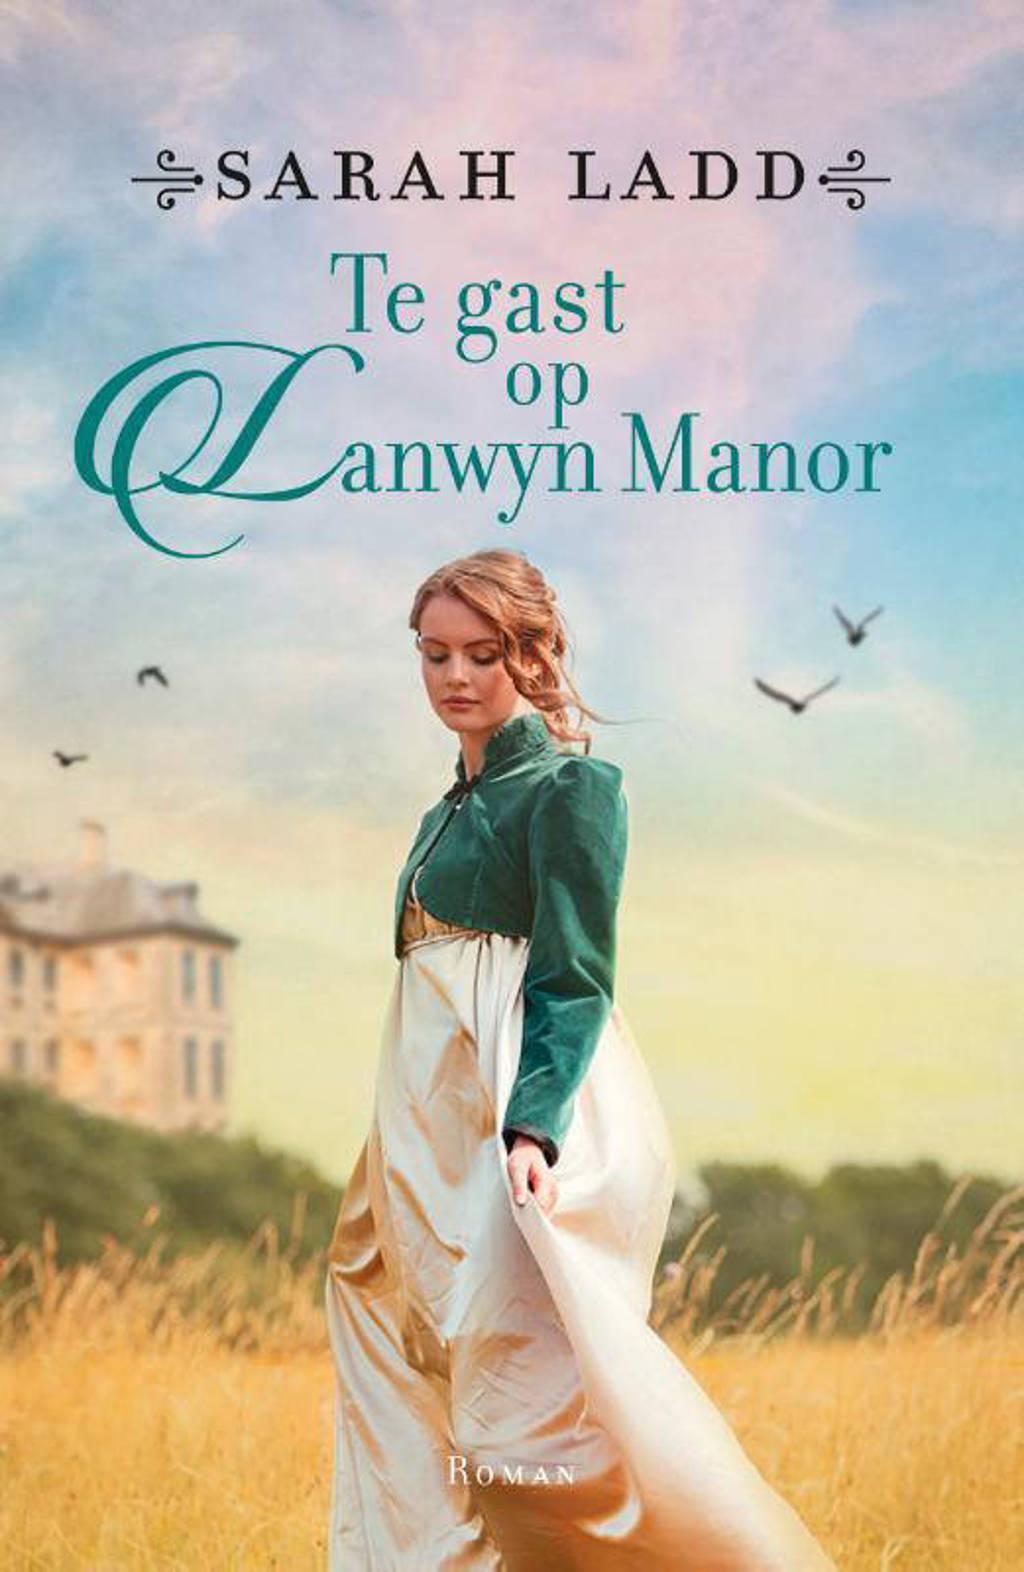 Te gast op Lanwyn Manor - Sarah E. Ladd